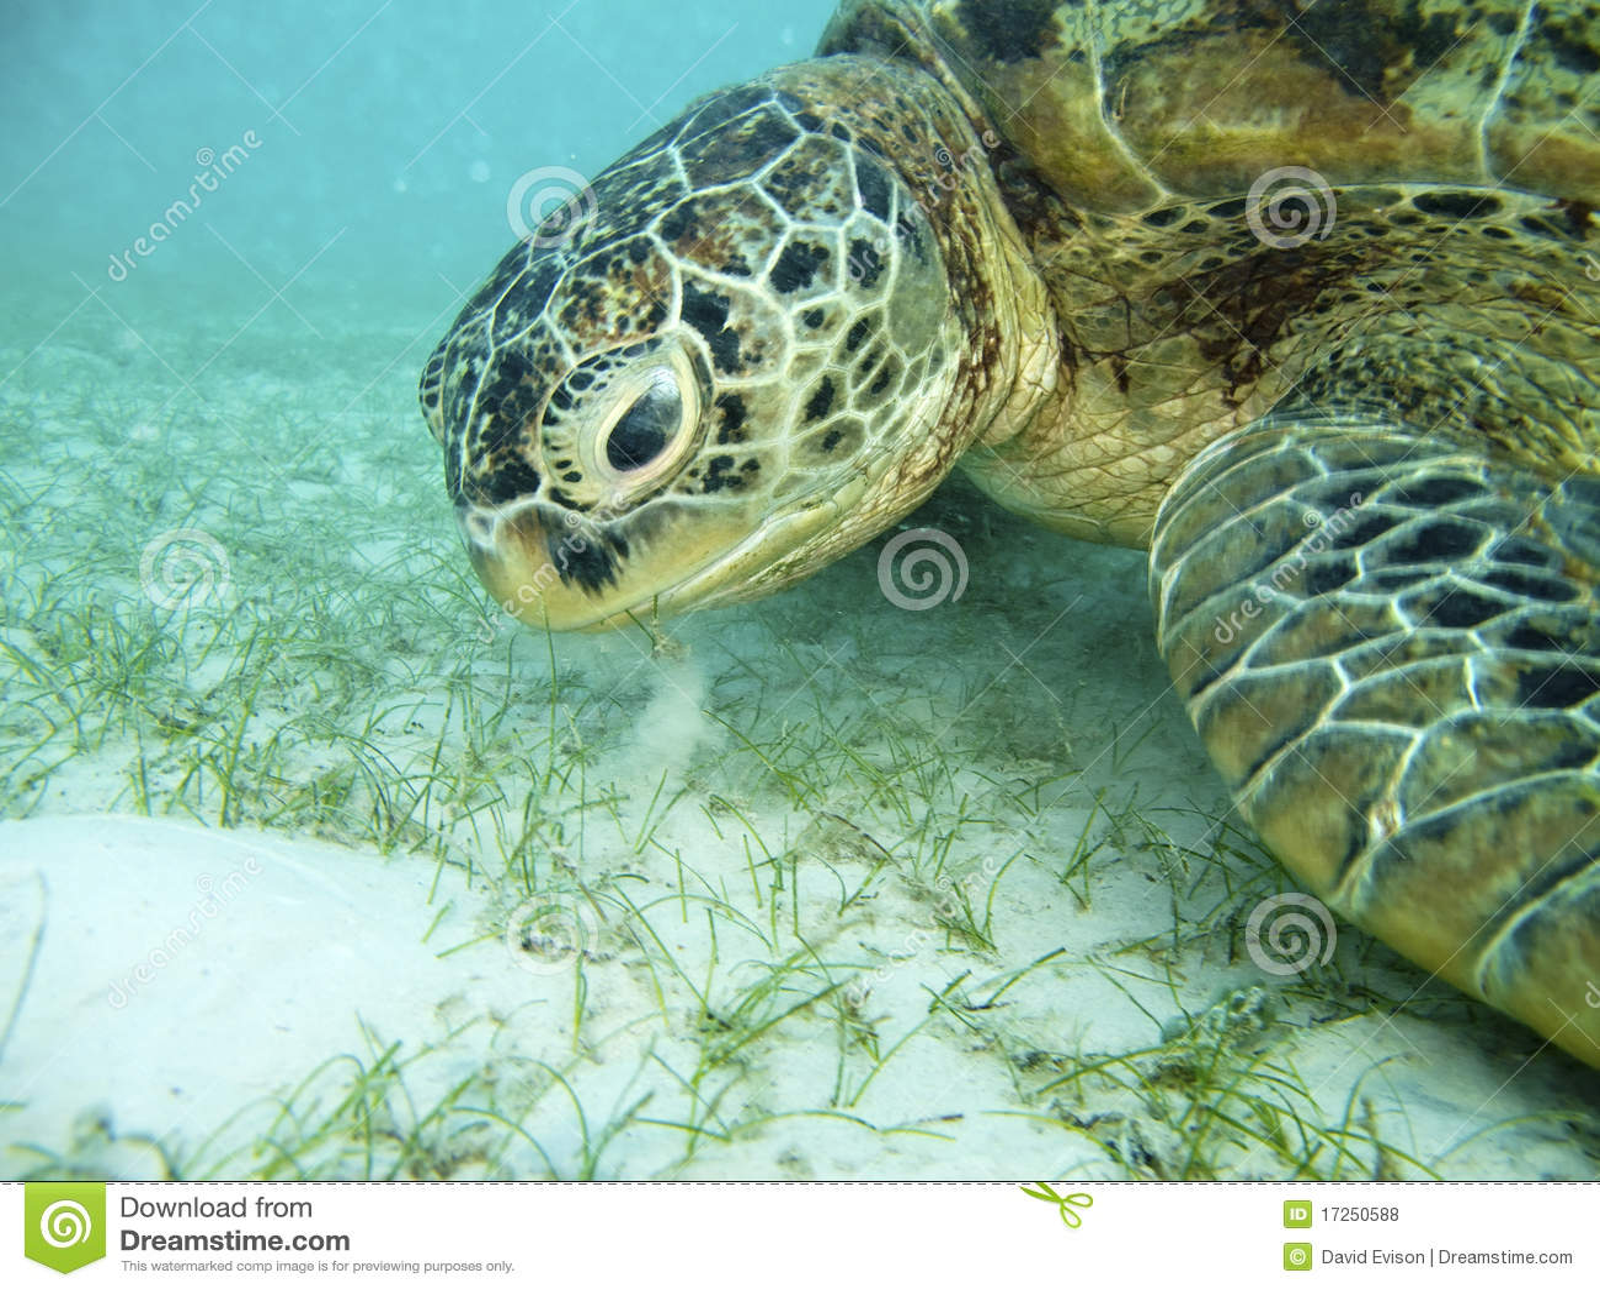 Turtle Feeding. Royalty Free Stock Photos - Image: 17250588